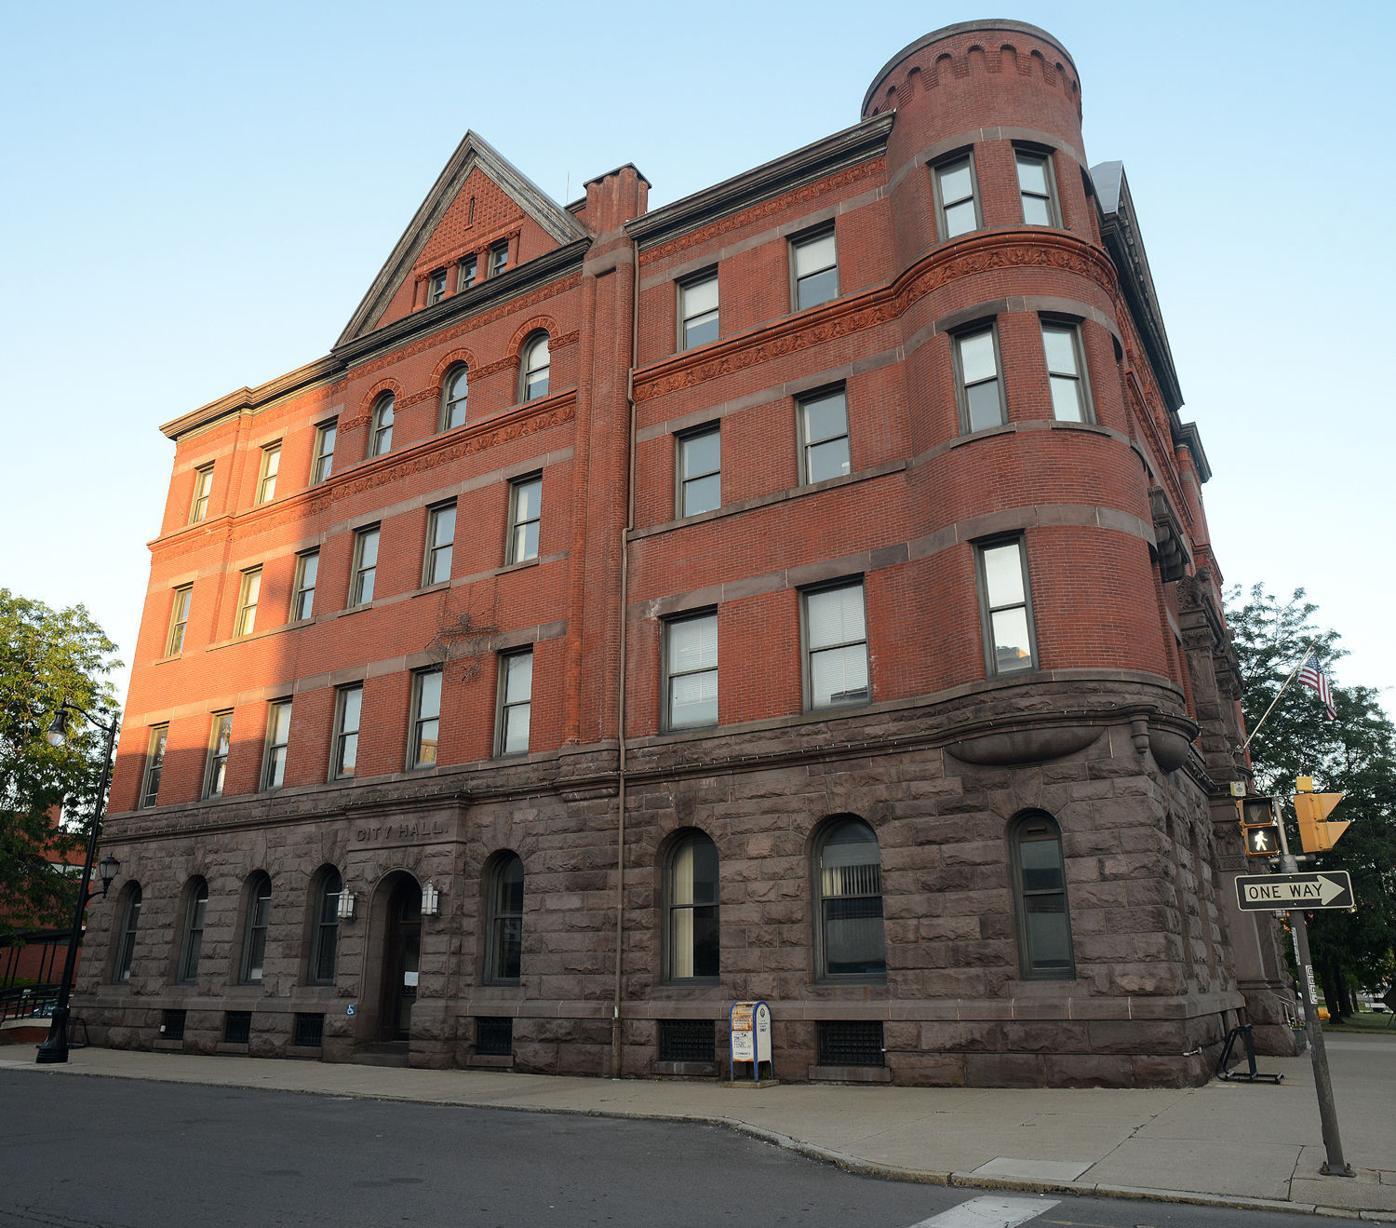 Wilkes-Barre City Hall